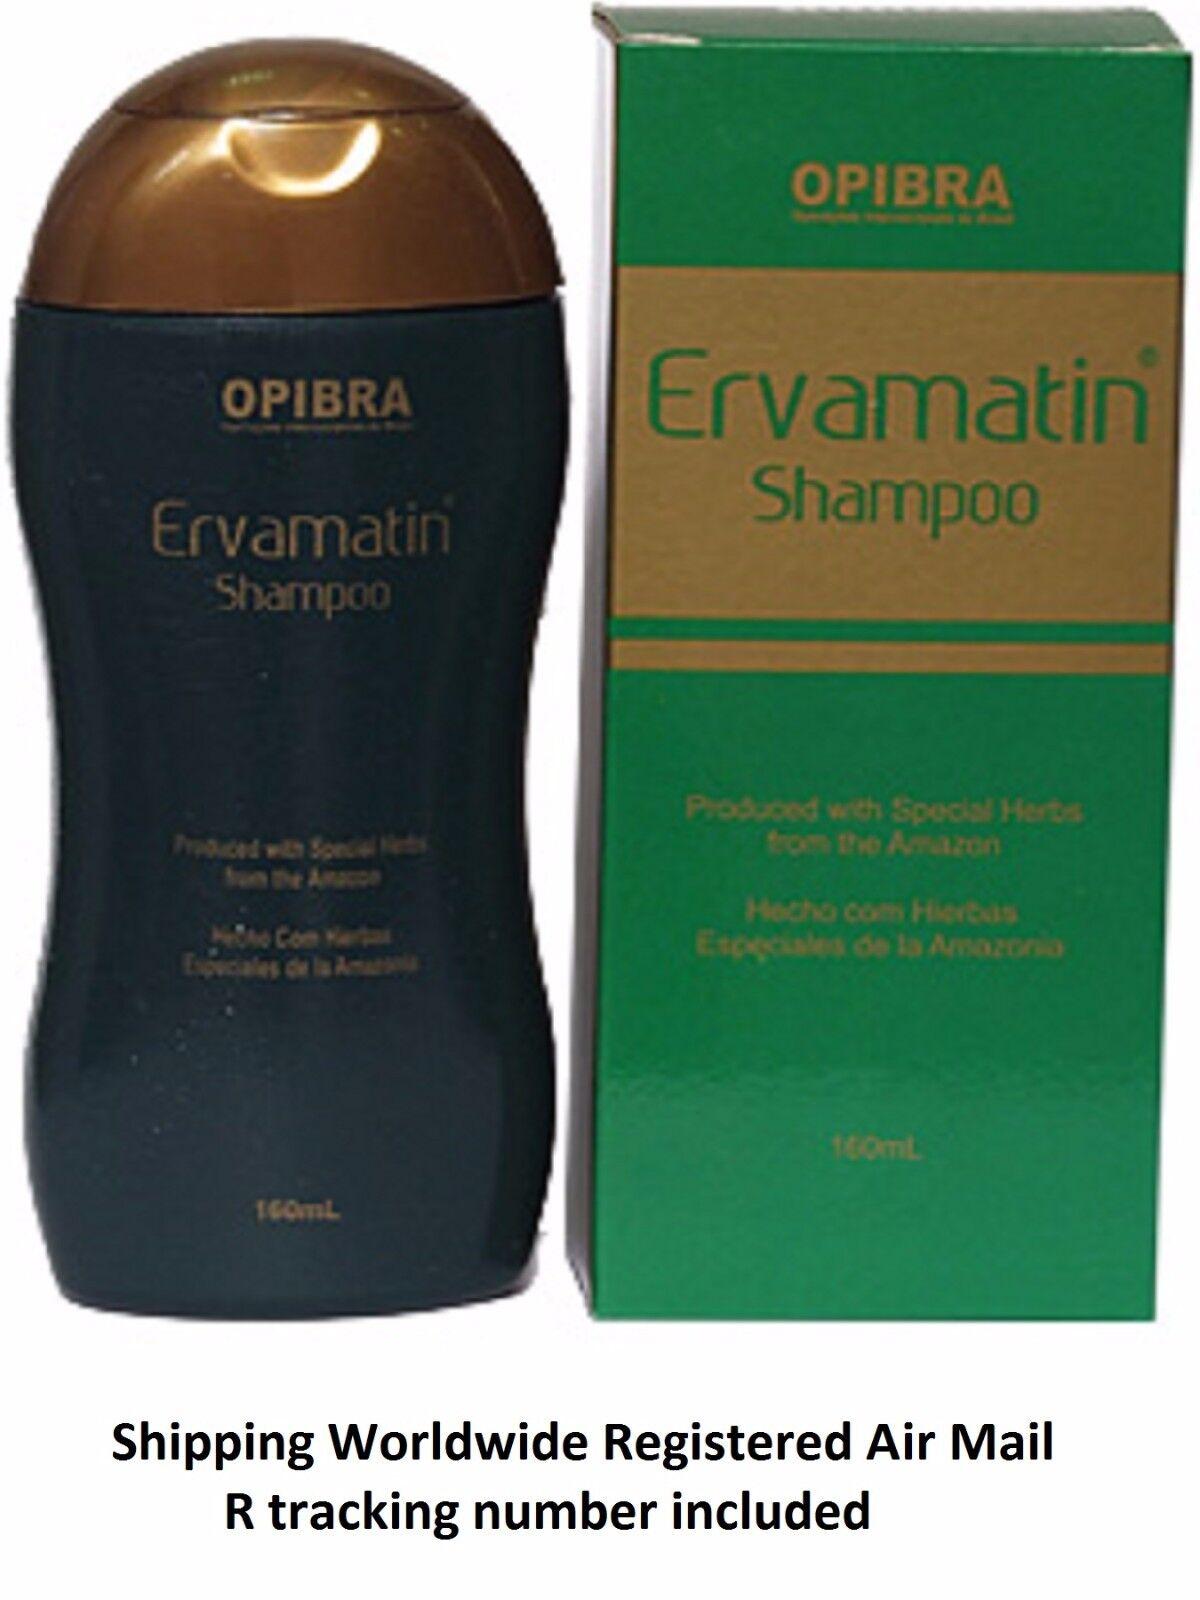 Ean 7897359400055 Product Image For Ervamatin Shampoo 160ml Šampon